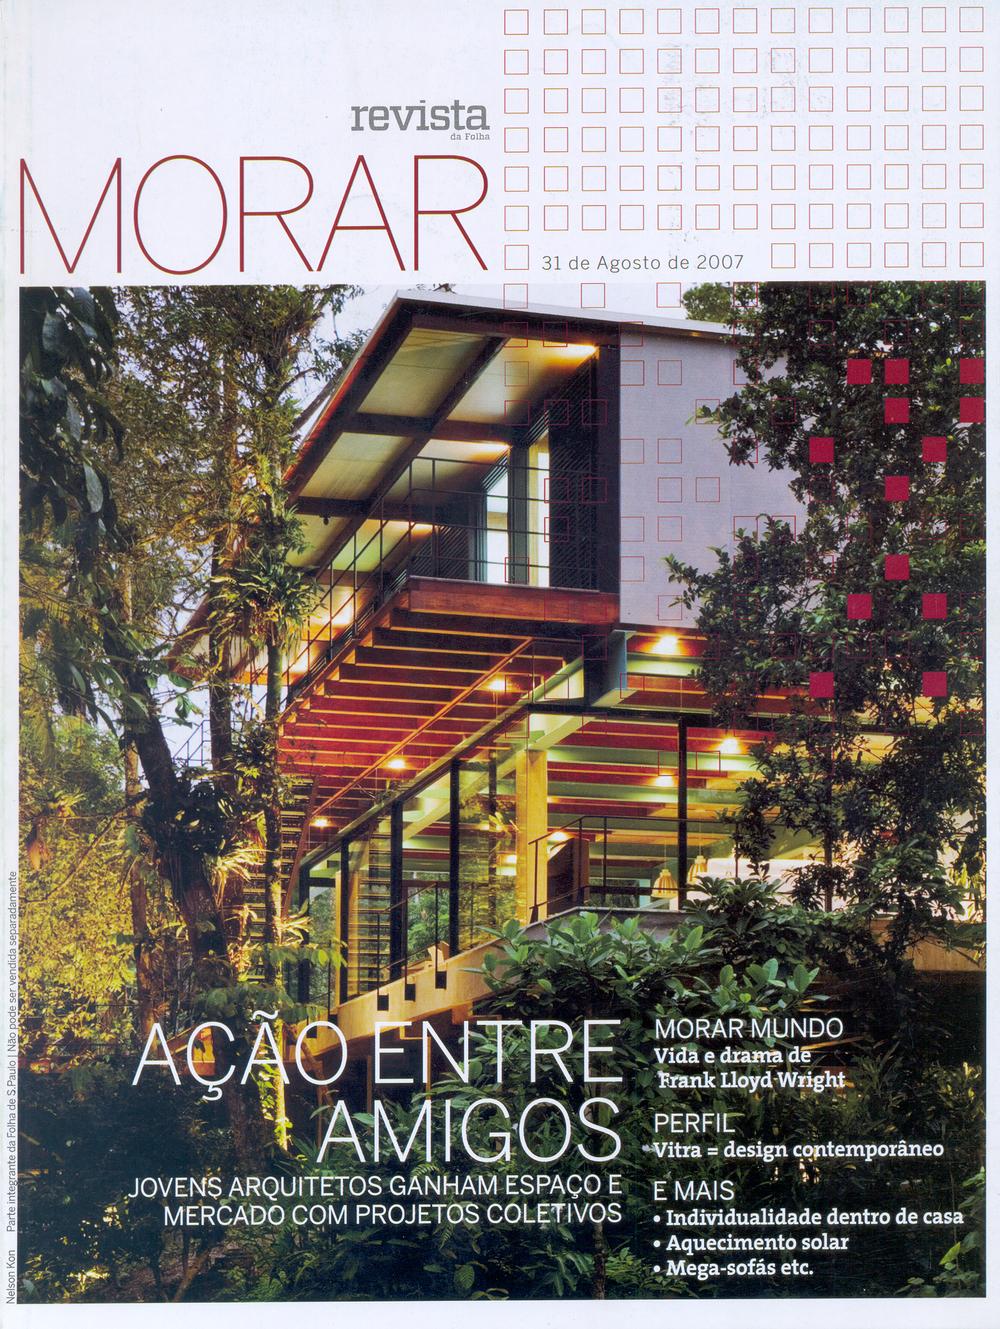 revista da folha MORAR 31.08.2007.jpg